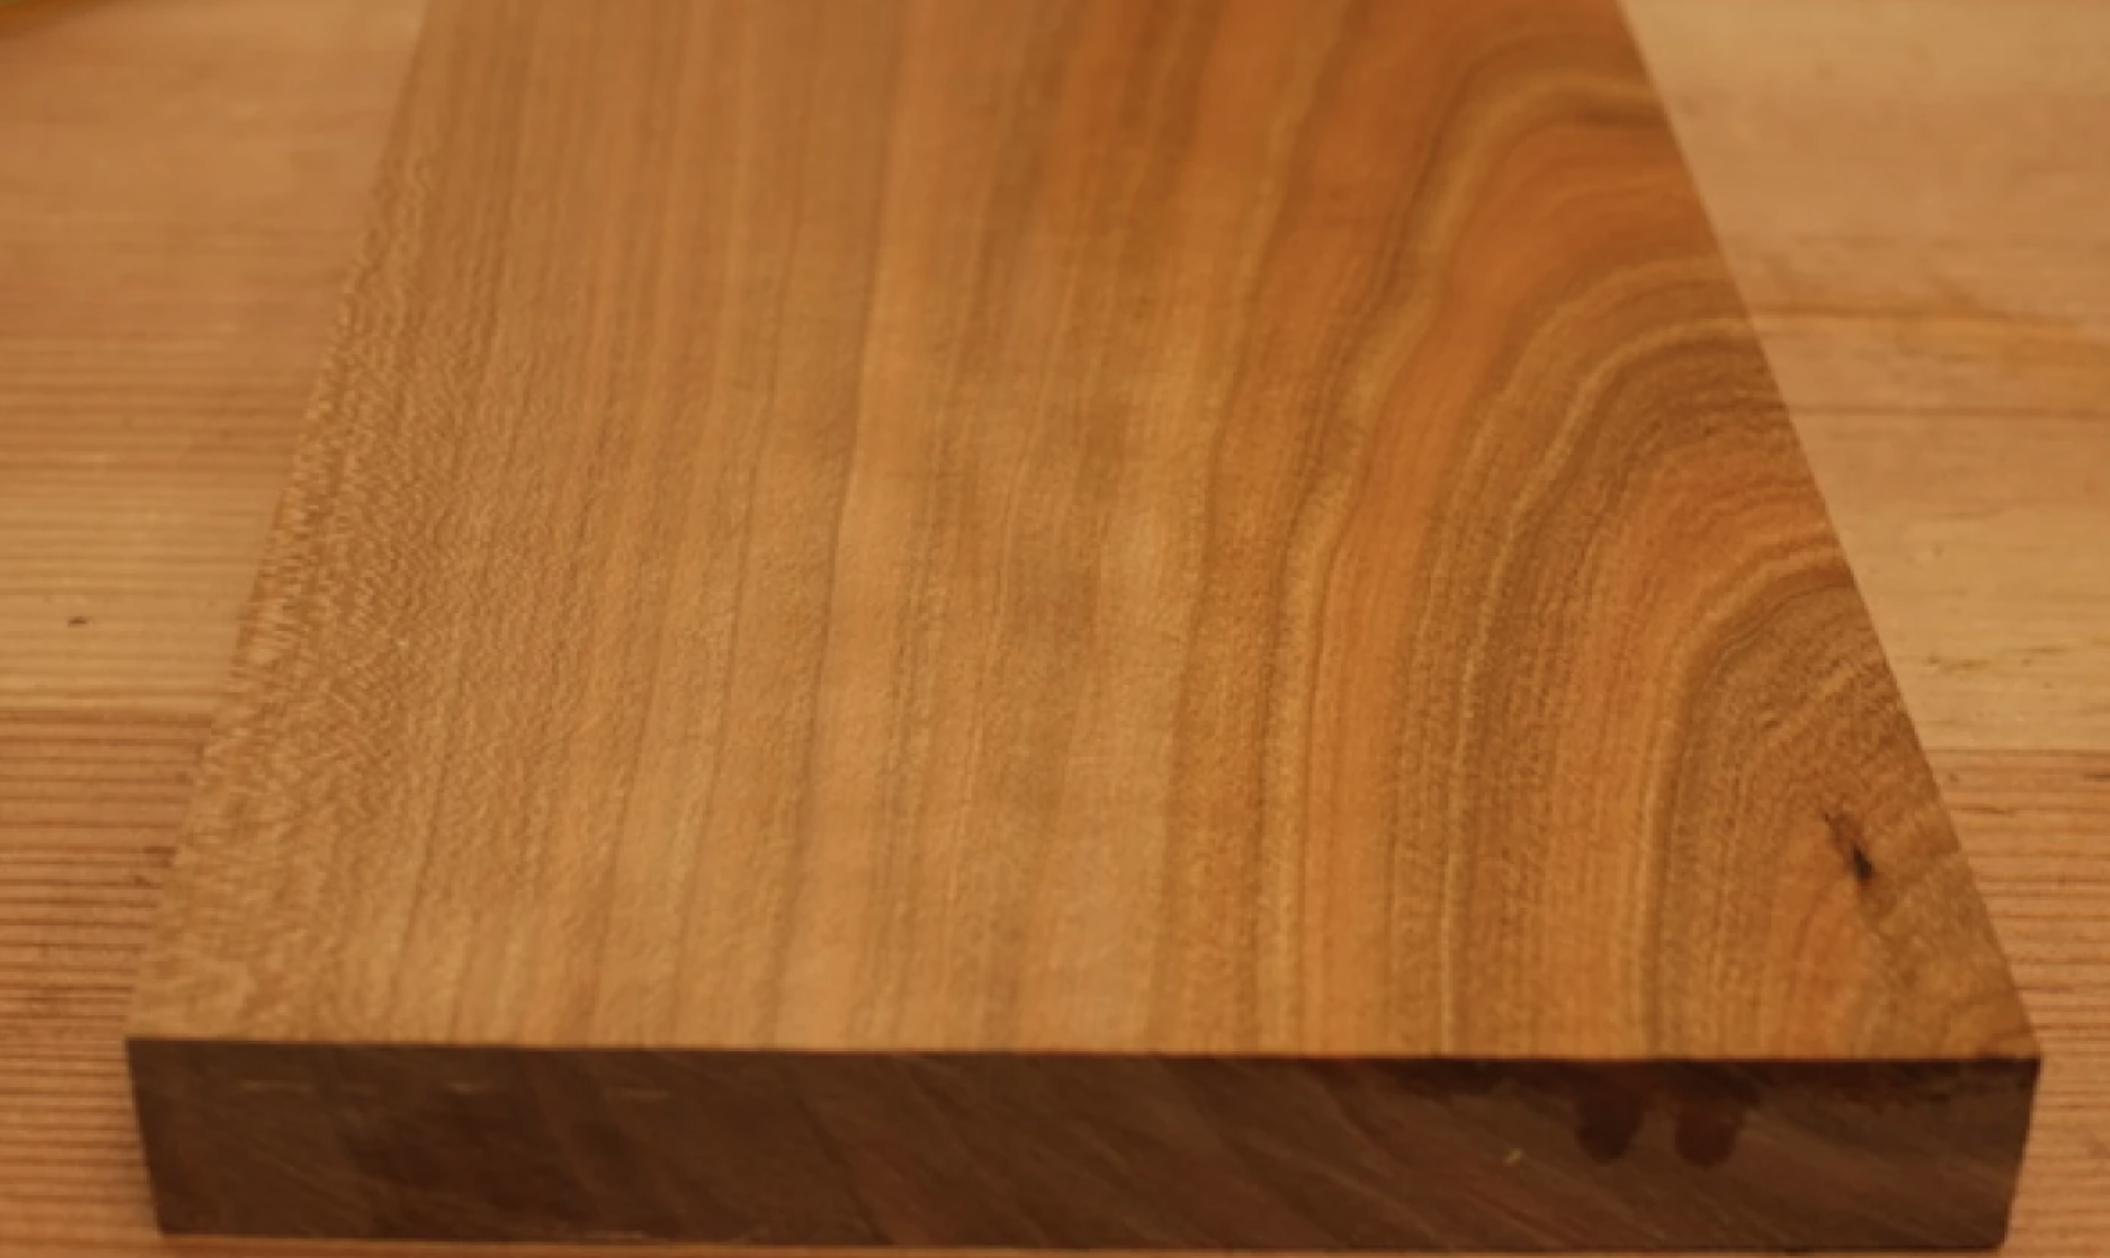 shellac waxed wood